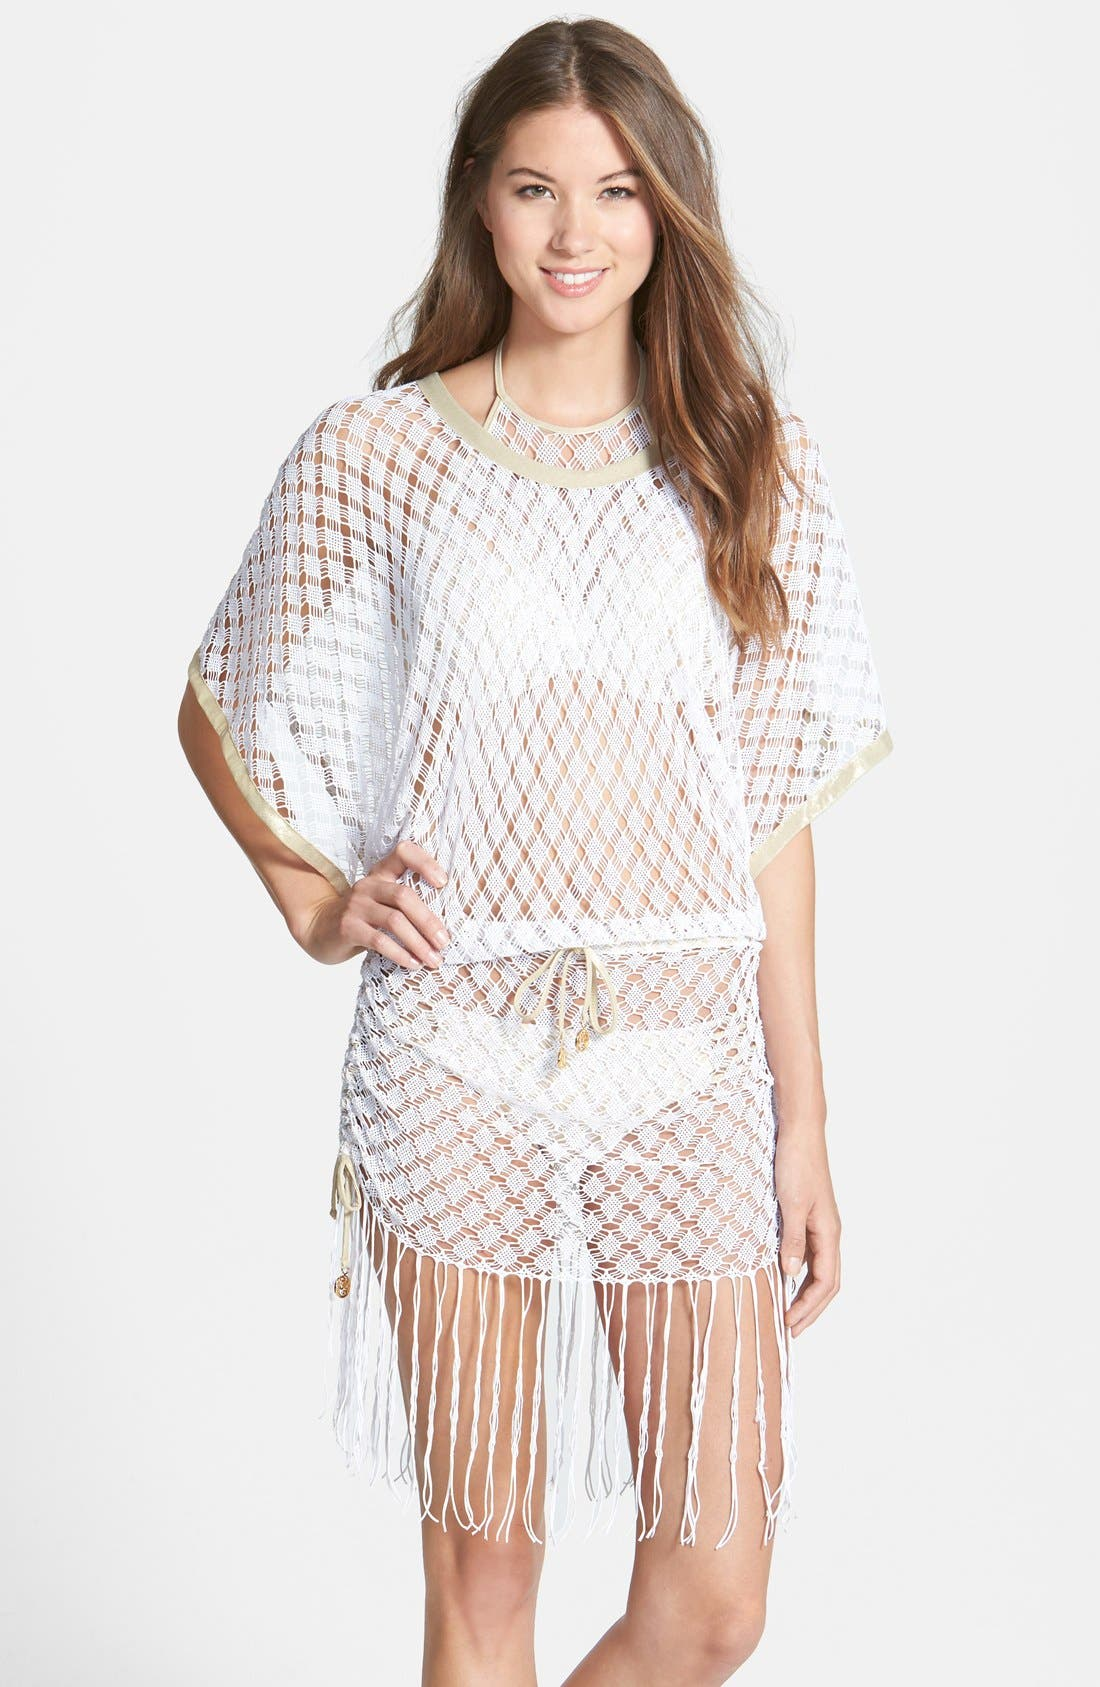 Main Image - Luli Fama 'South Beach' Crochet Cover-Up Dress